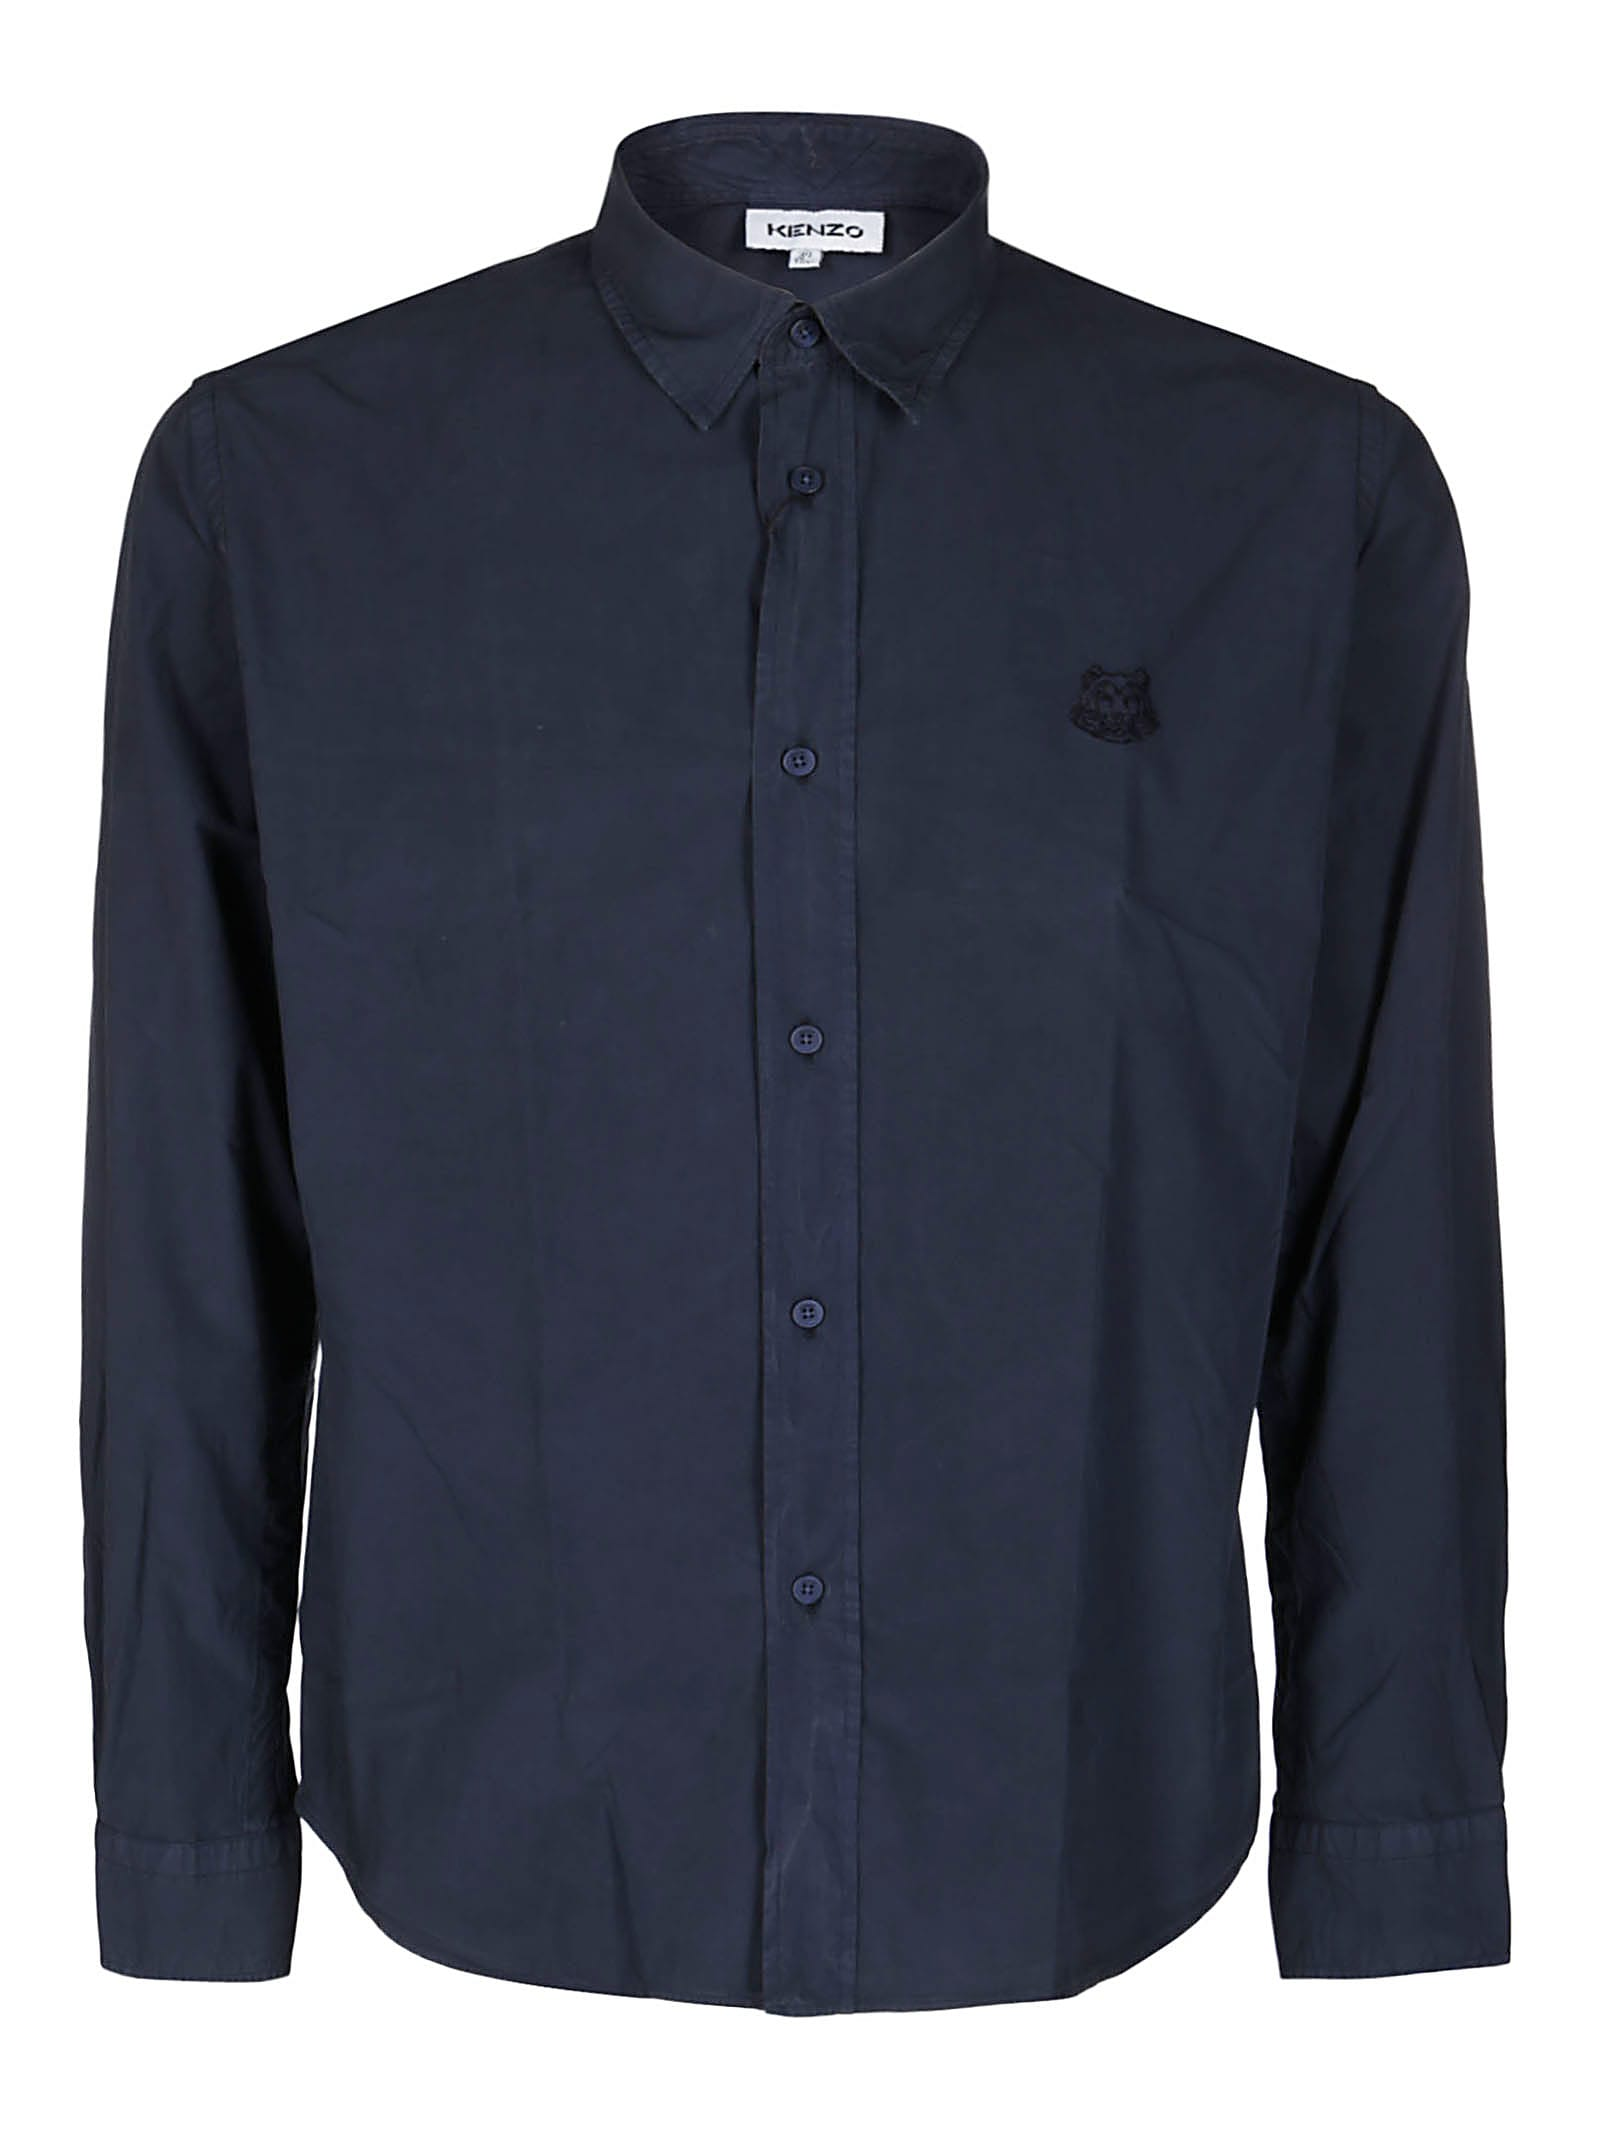 Kenzo Blue Cotton Shirt